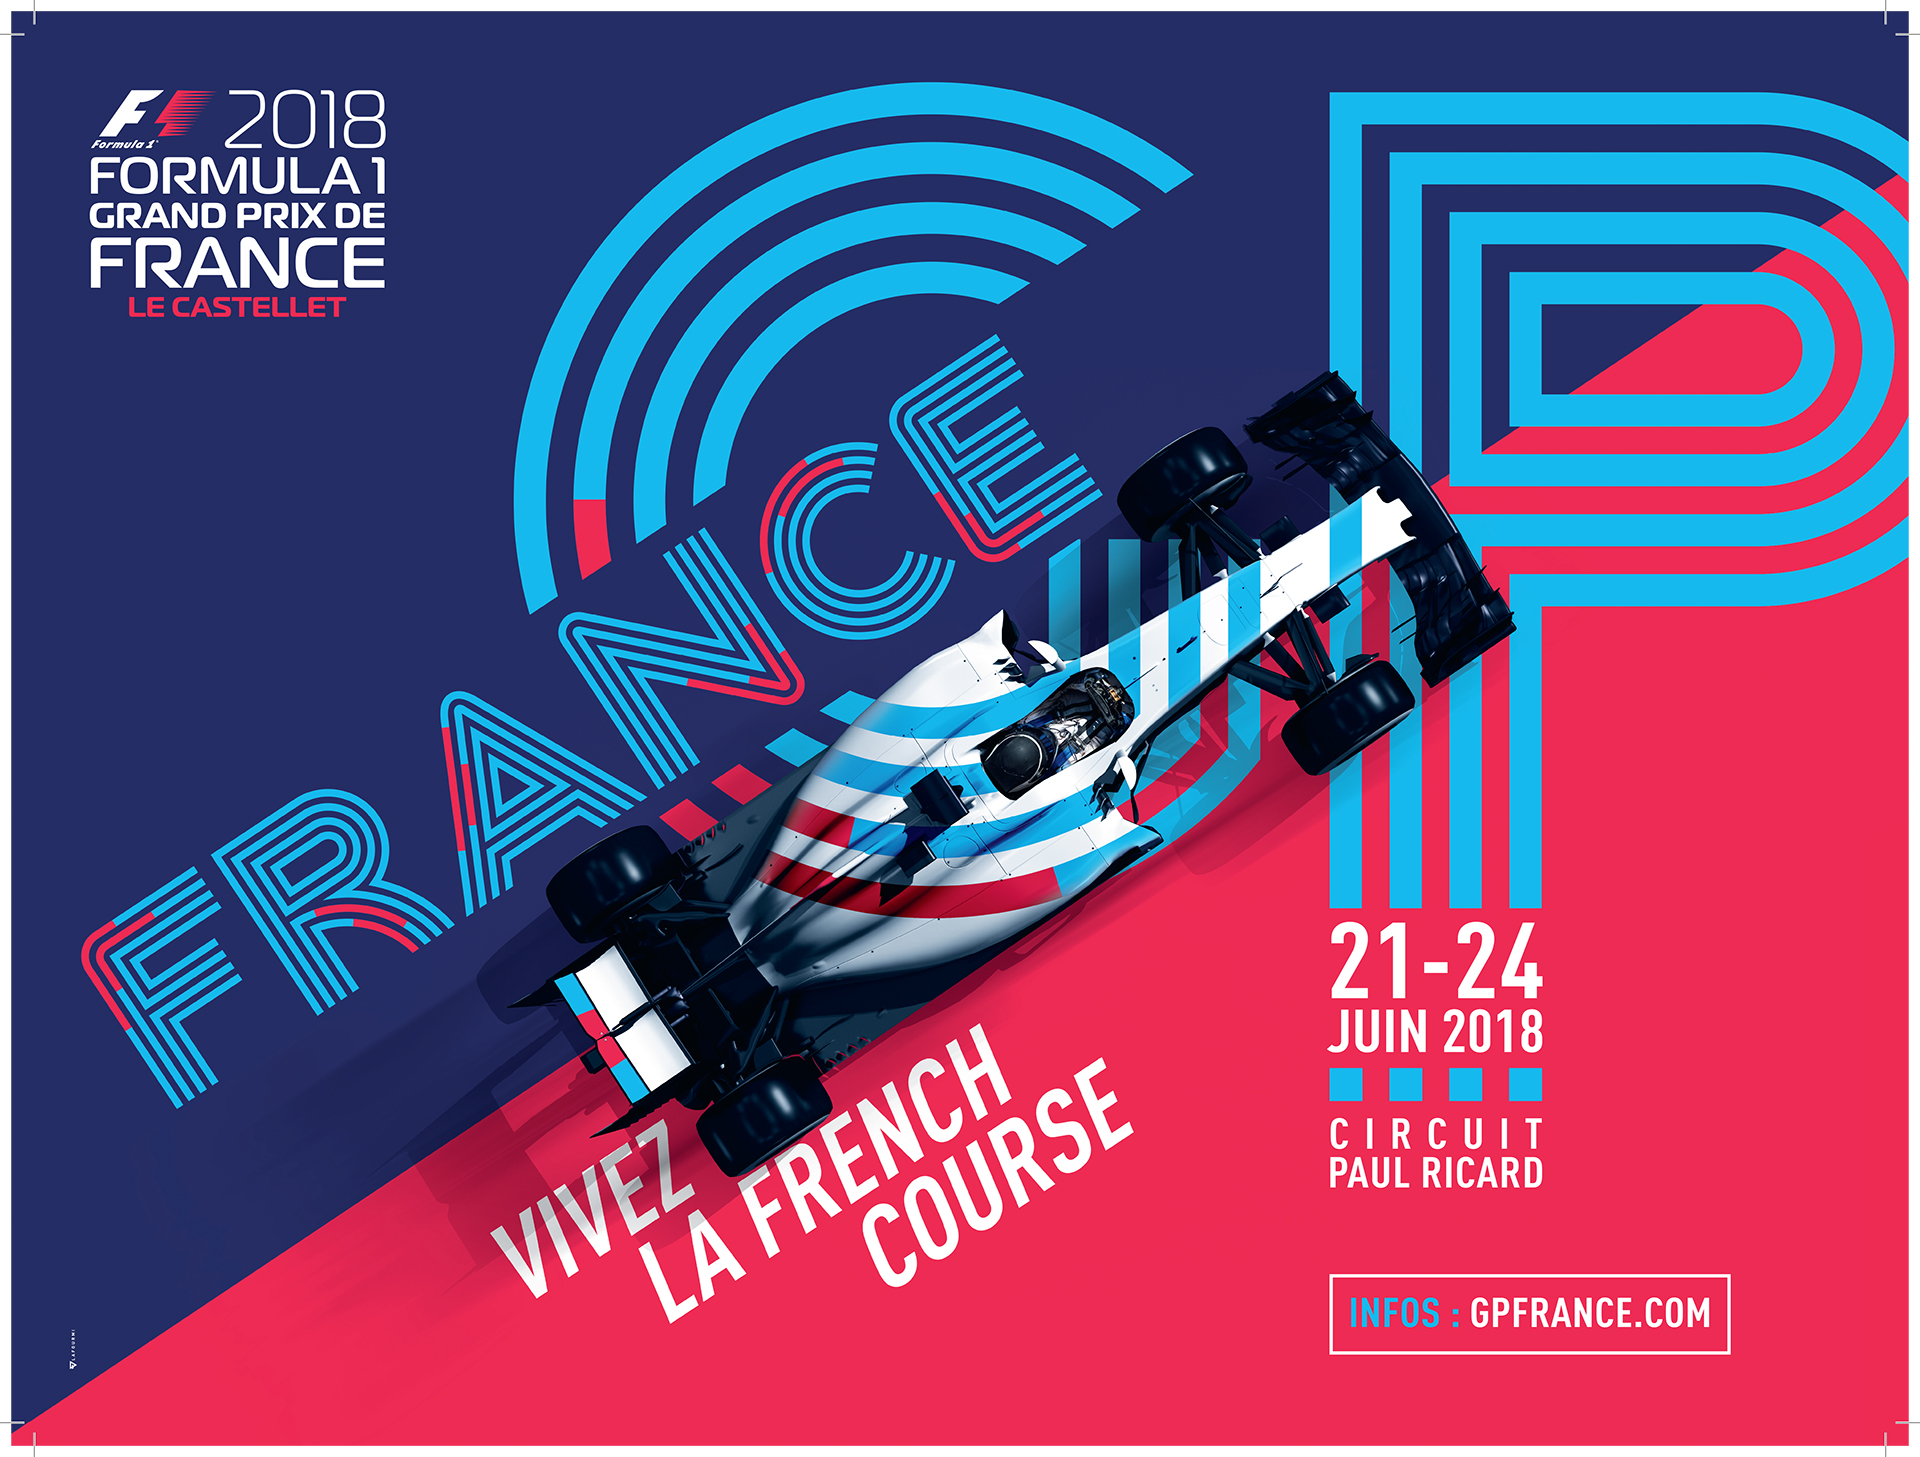 F1 2018 Grand Prix de France : debrief de la conférence #GPFranceF1 #VivezLaFrenchCourse